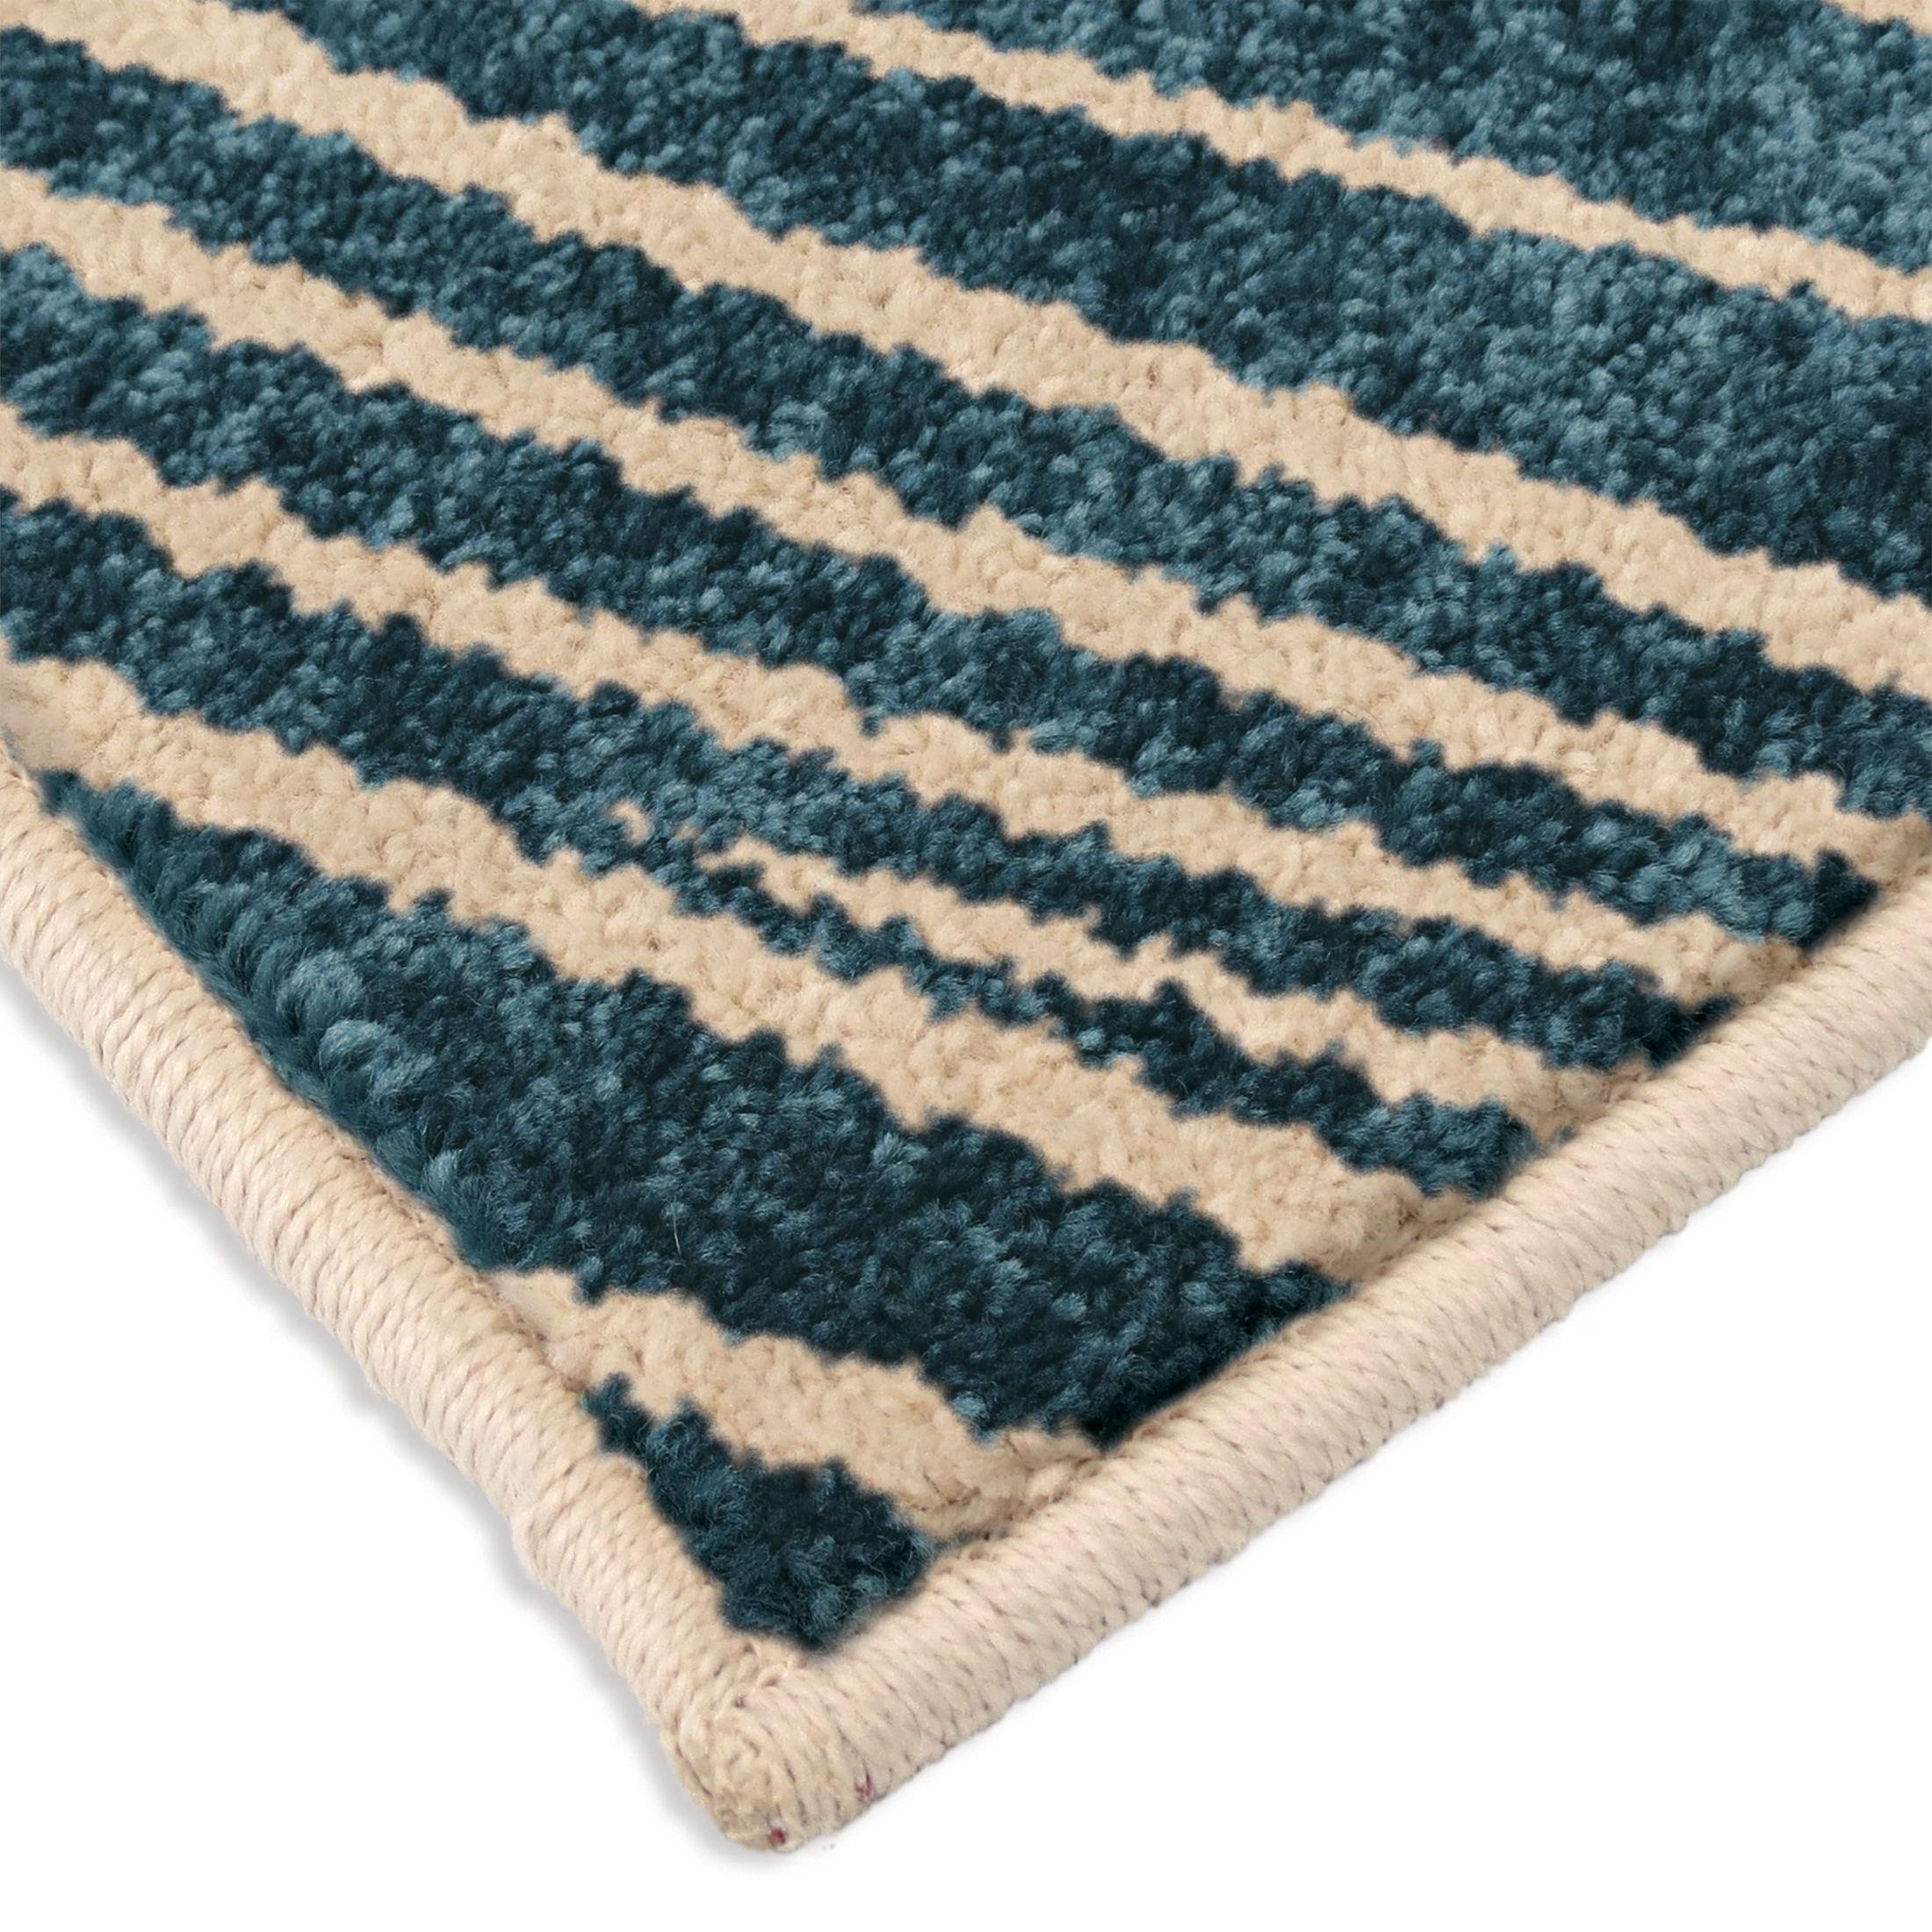 Outdoor 5x8 Area Rug: Orian Rugs Indoor/Outdoor Chevron Wendover Multi Area